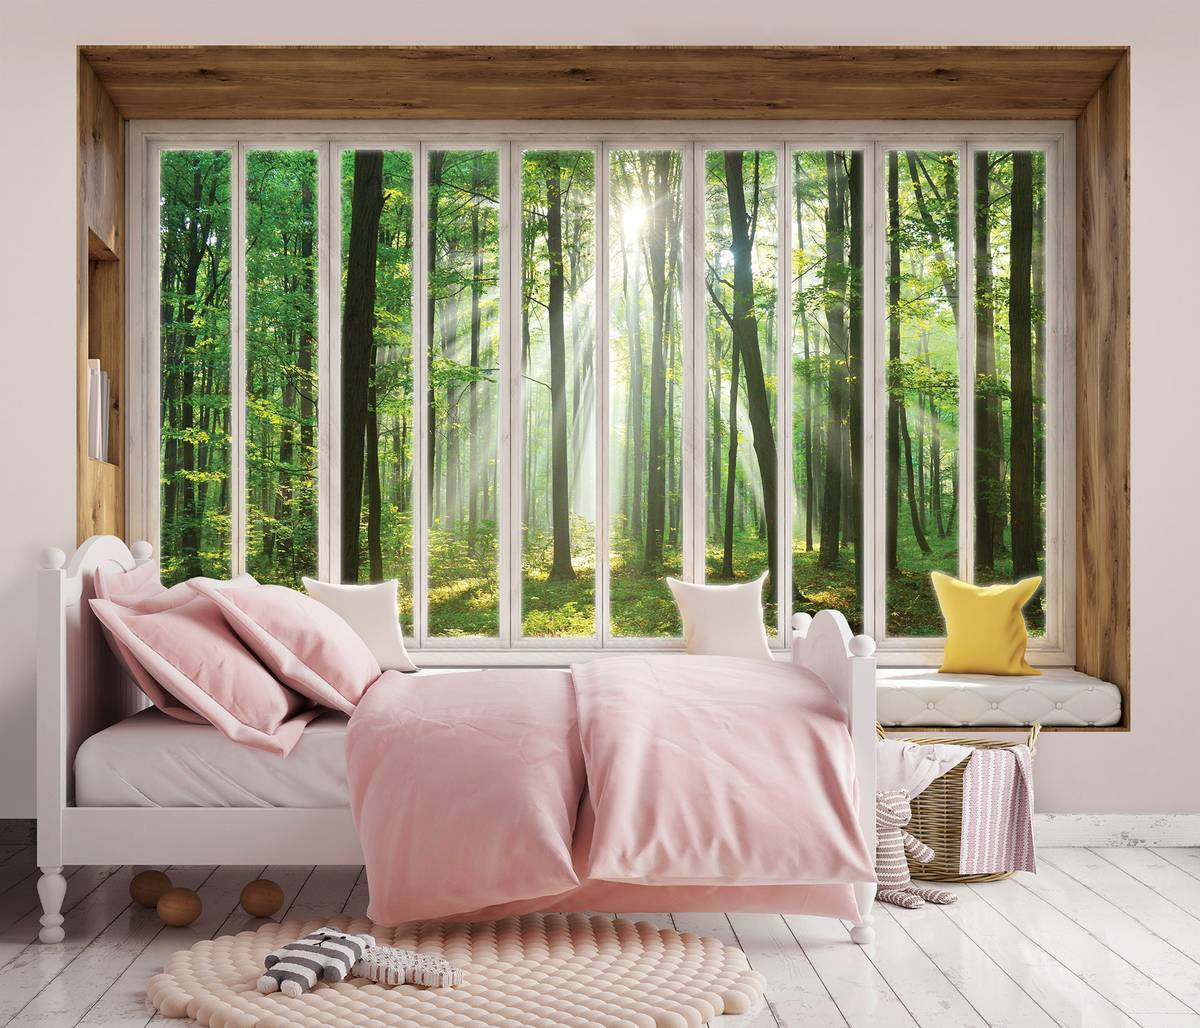 Fototapeta - Výhled z okna na les (T030445T254184B)